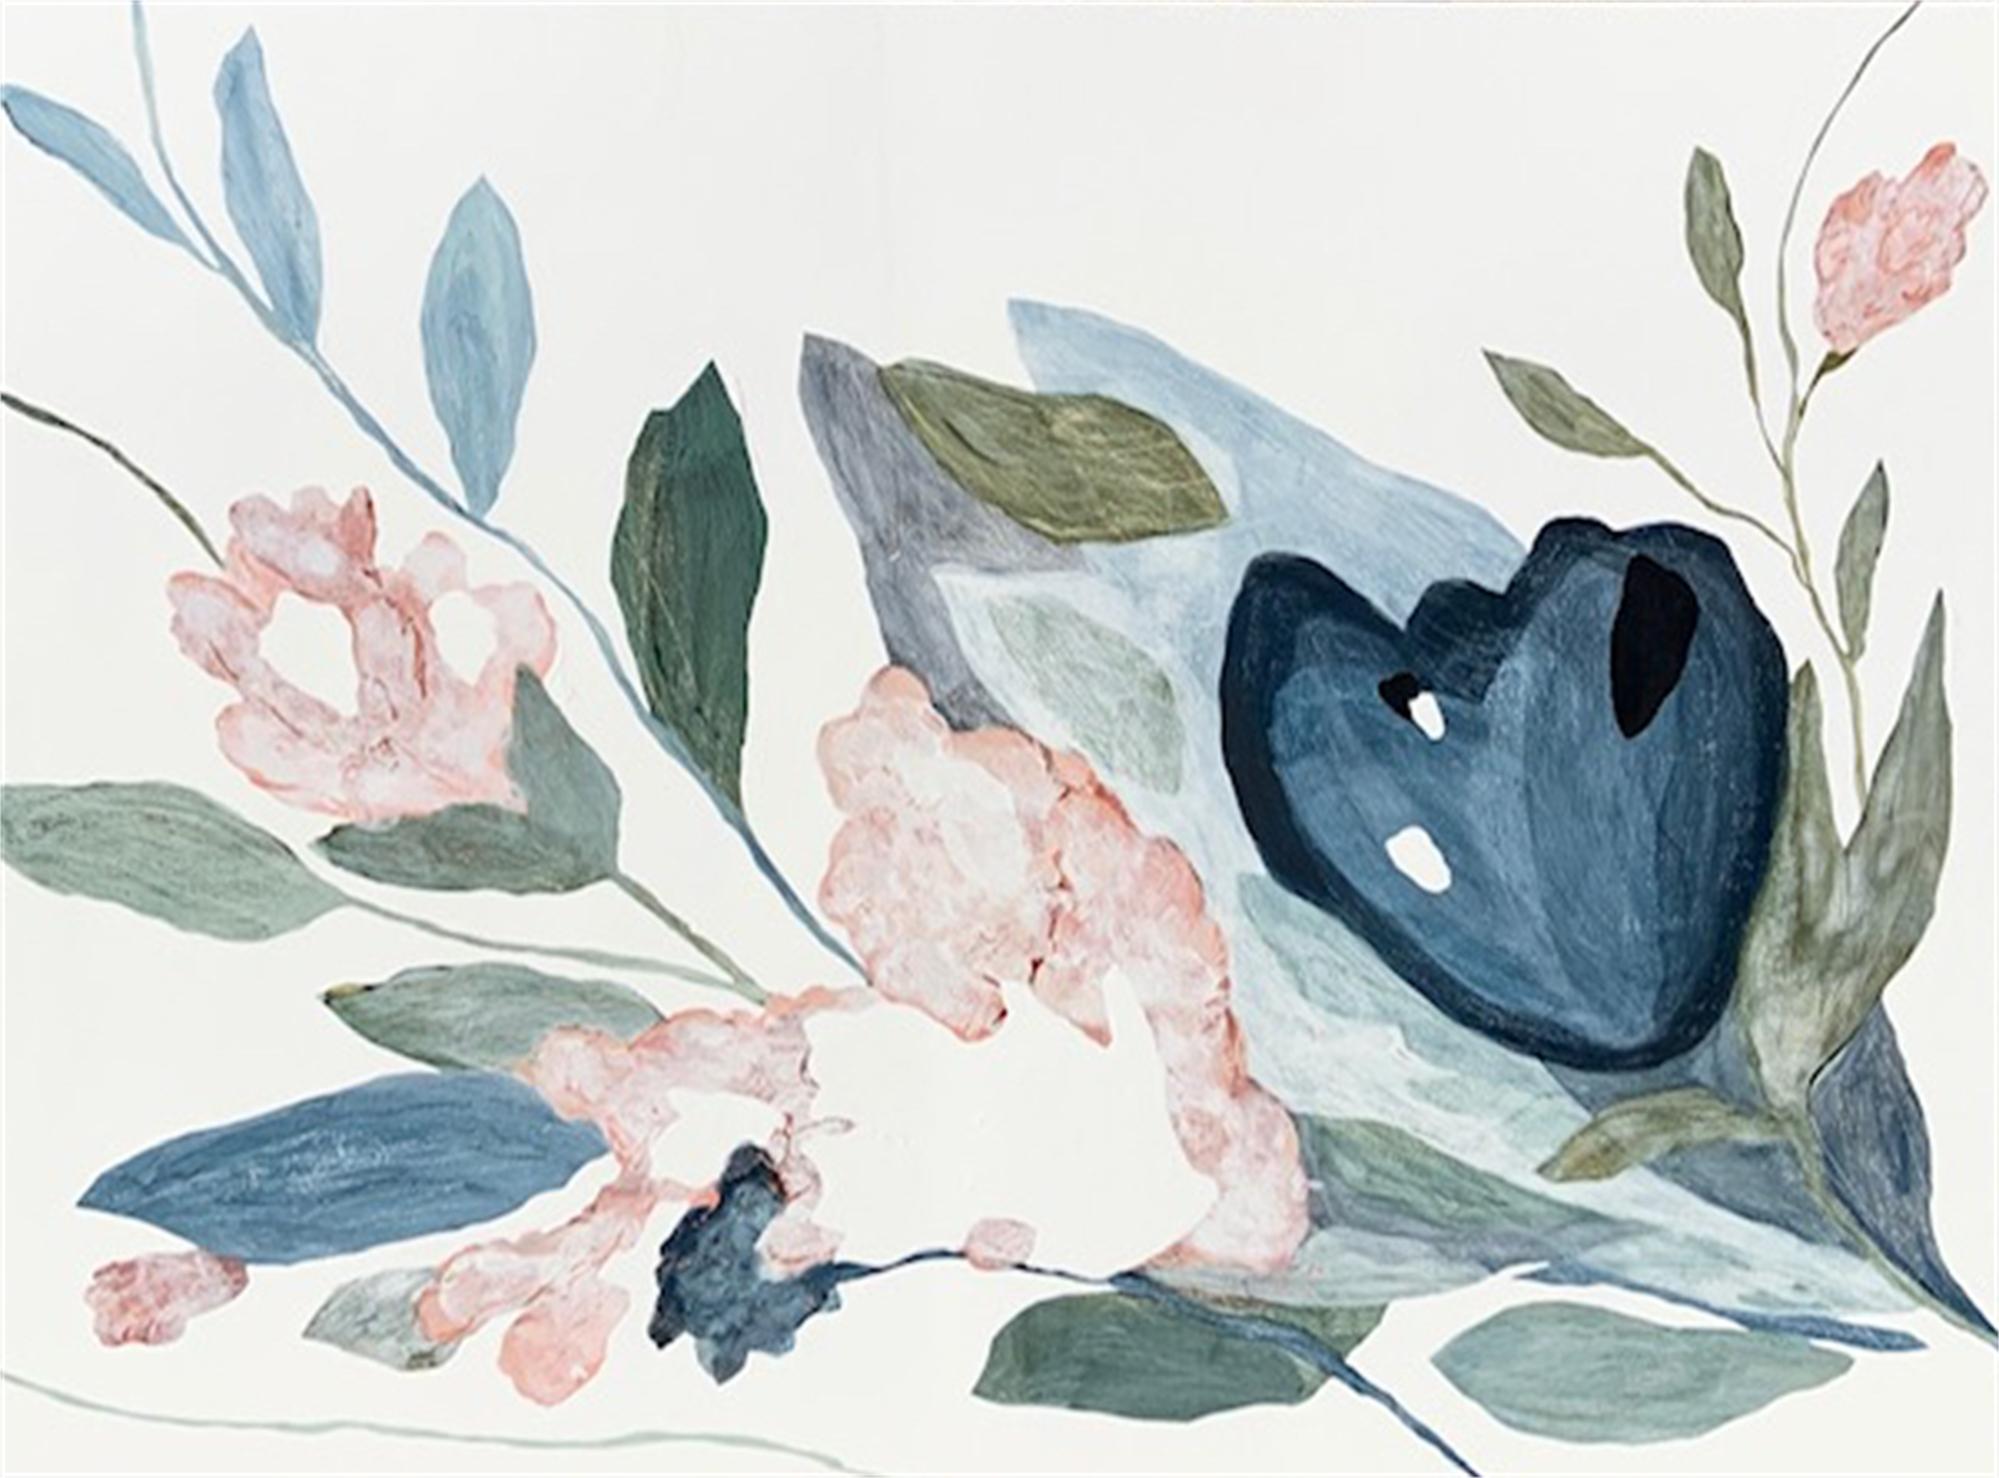 Hopeful by Vesela Baker